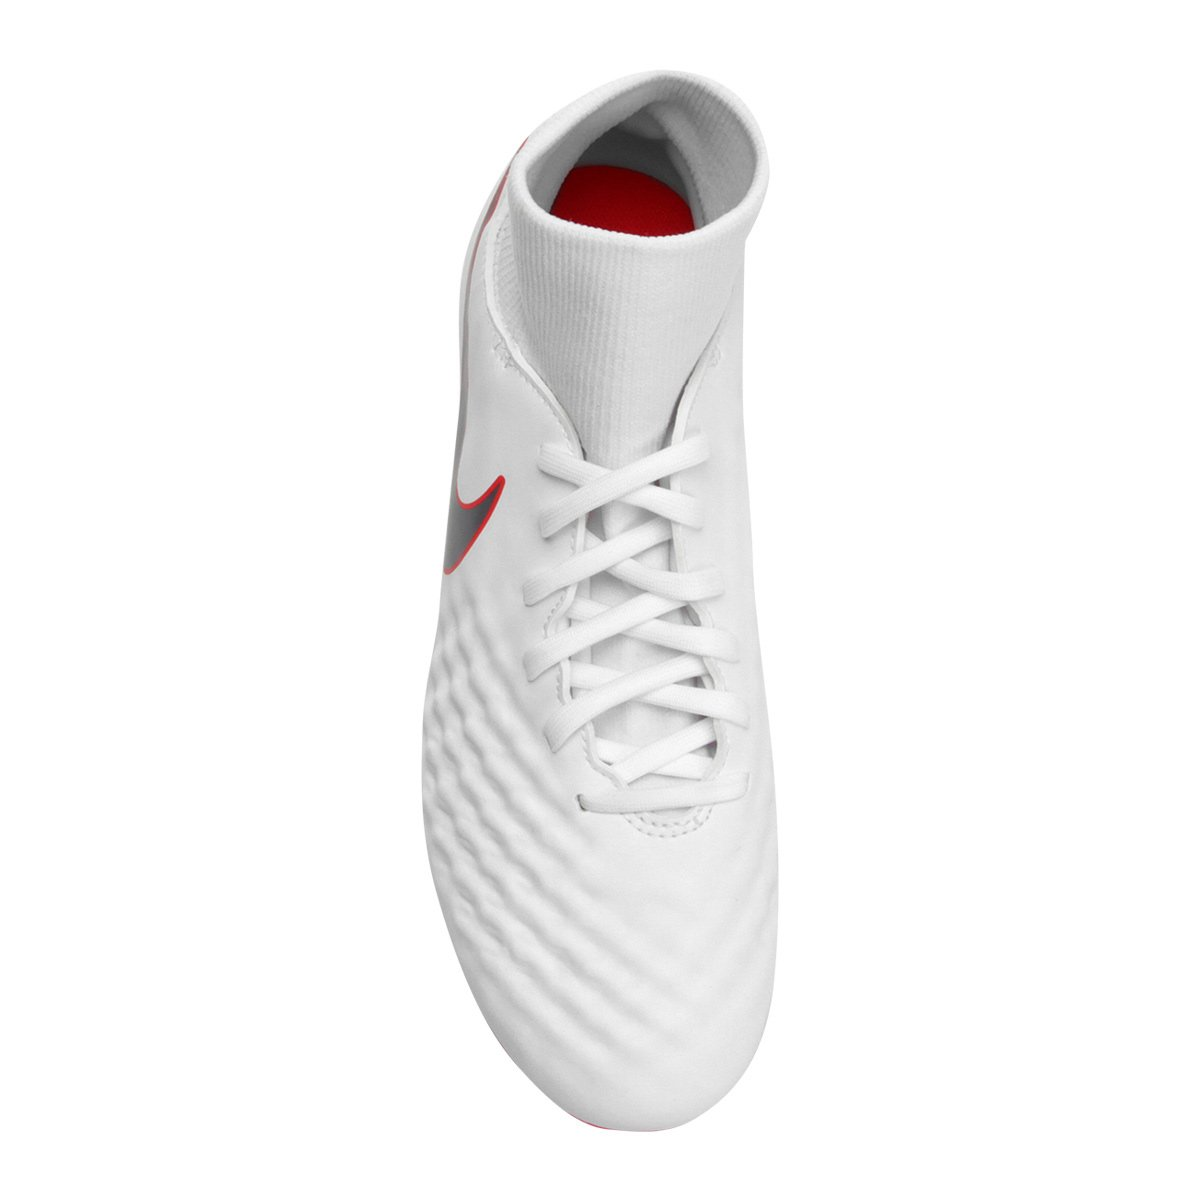 Chuteira Campo Nike Magista Obra 2 Academy DF FG - Branco e Cinza ... 84a8ad6187957